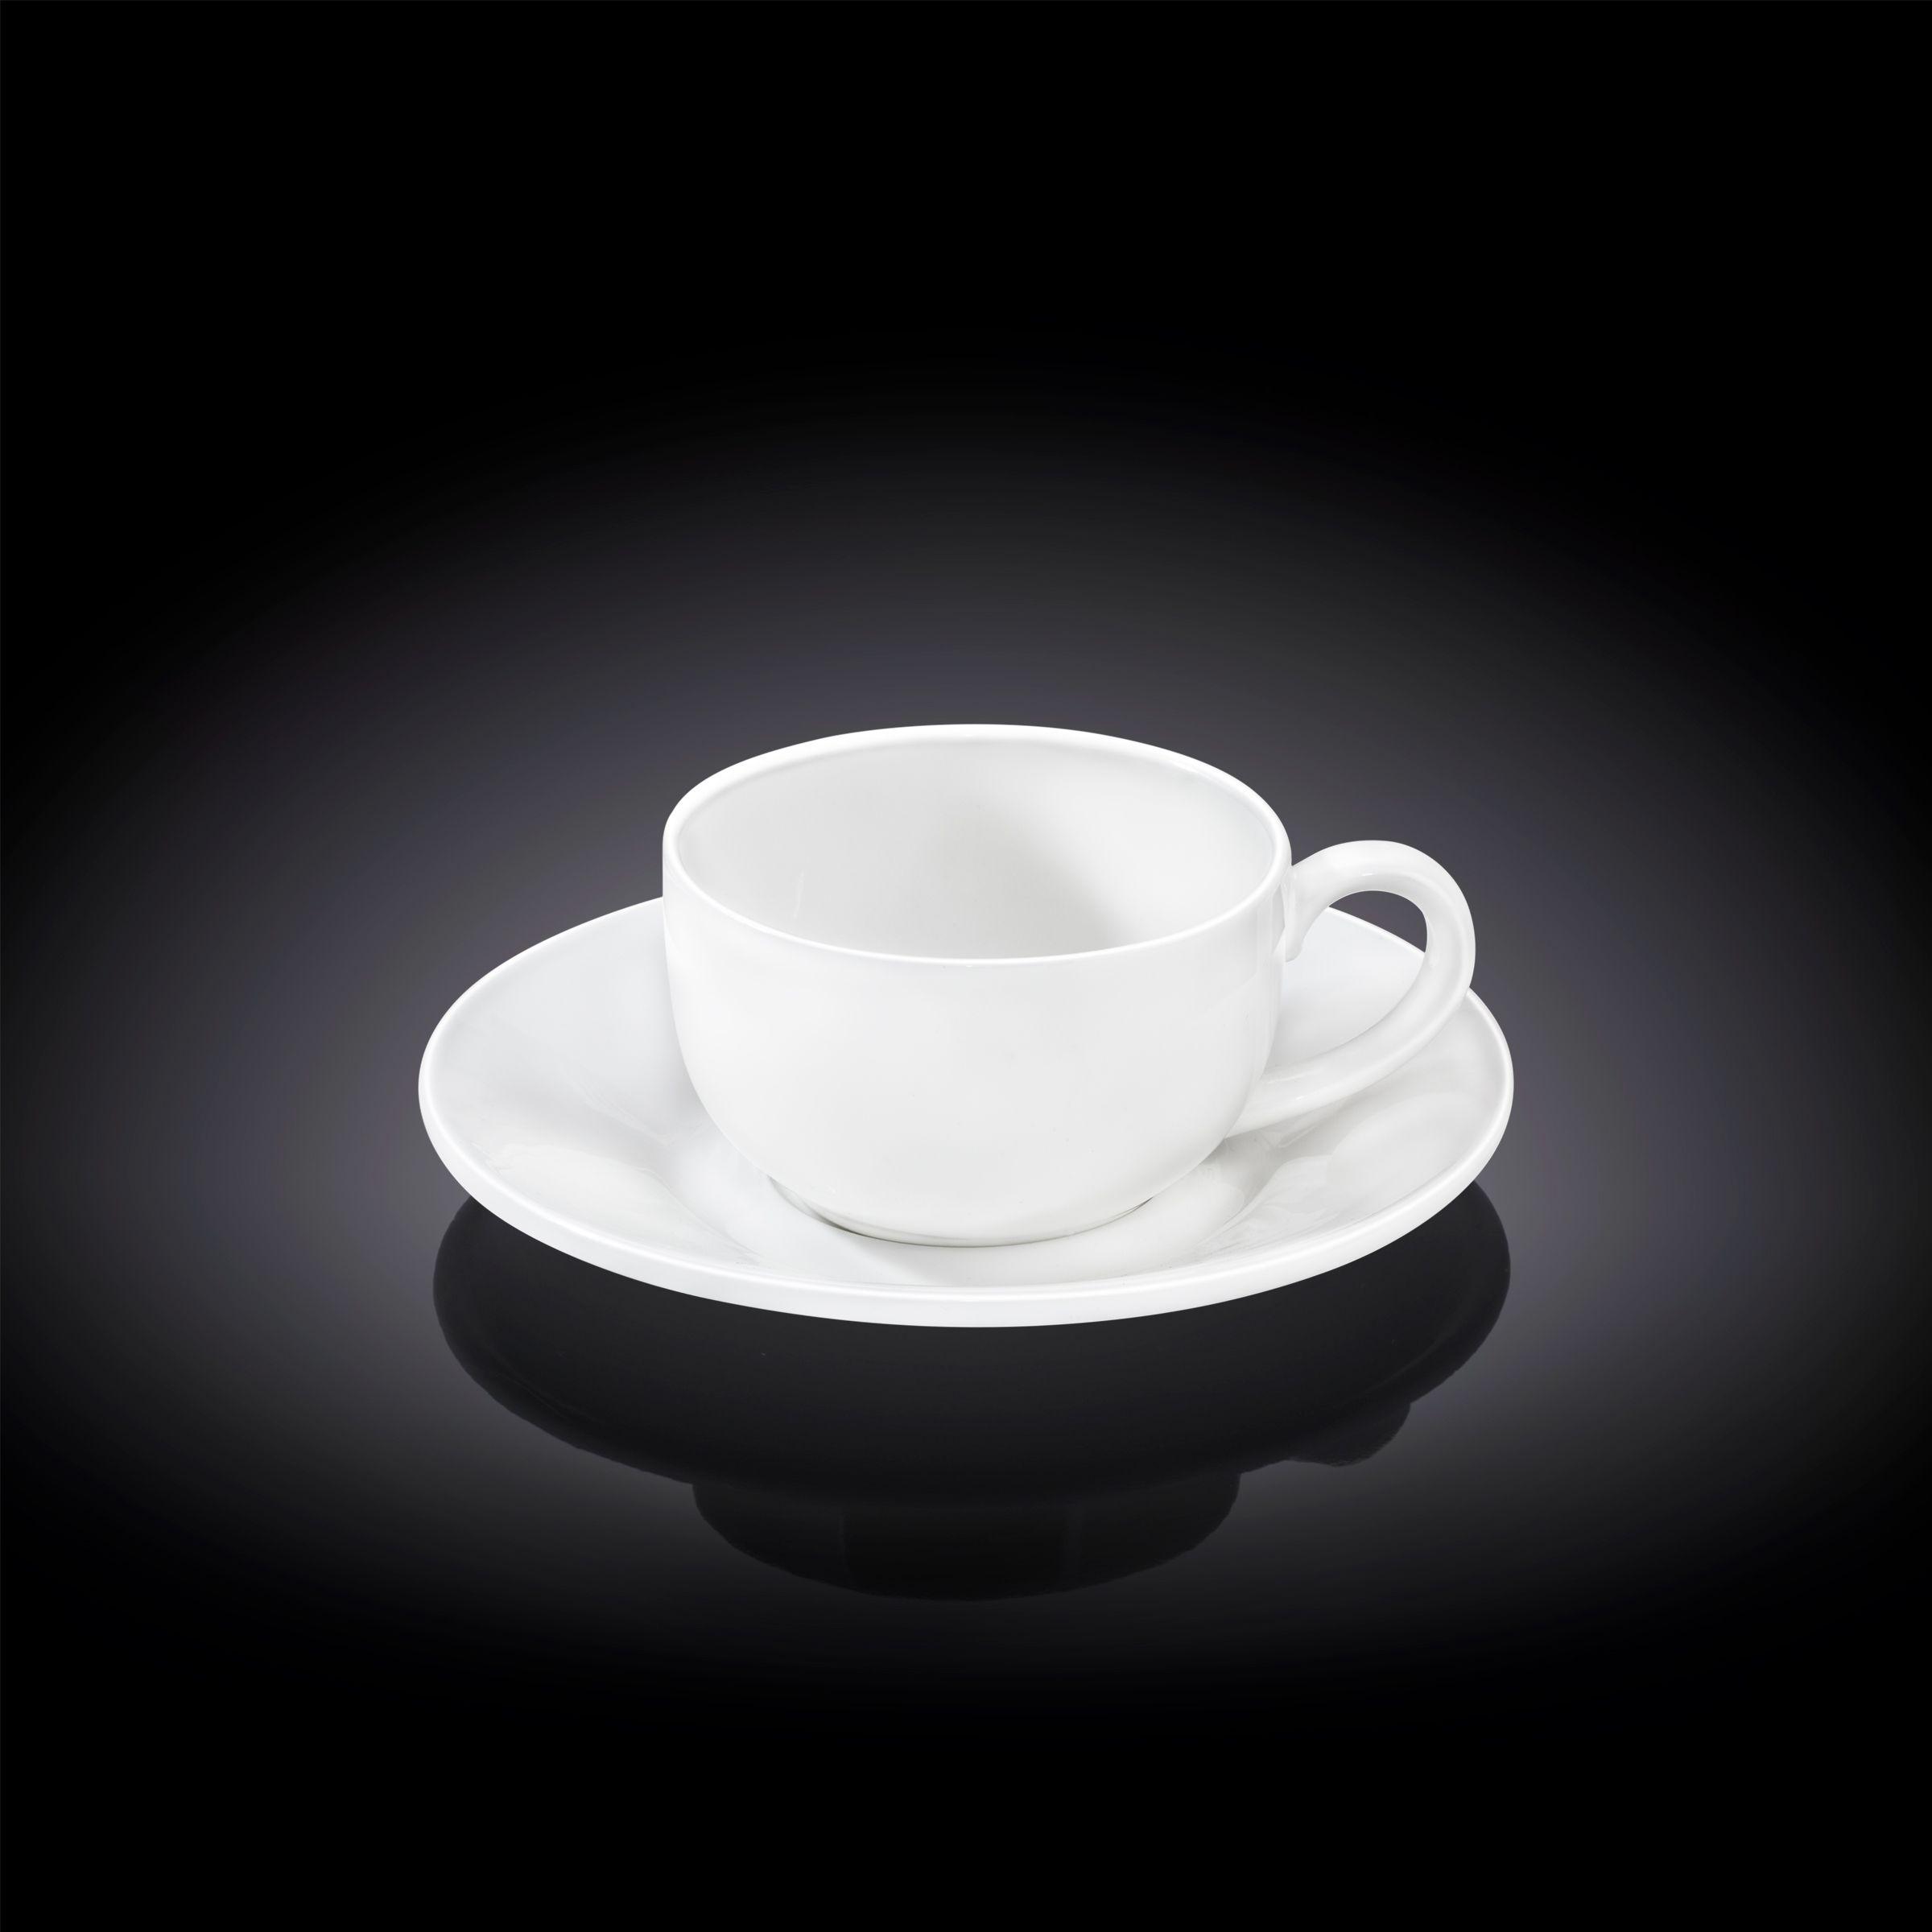 Набор чашка для кофе & блюдце 100 мл. Wilmax в инд. уп.